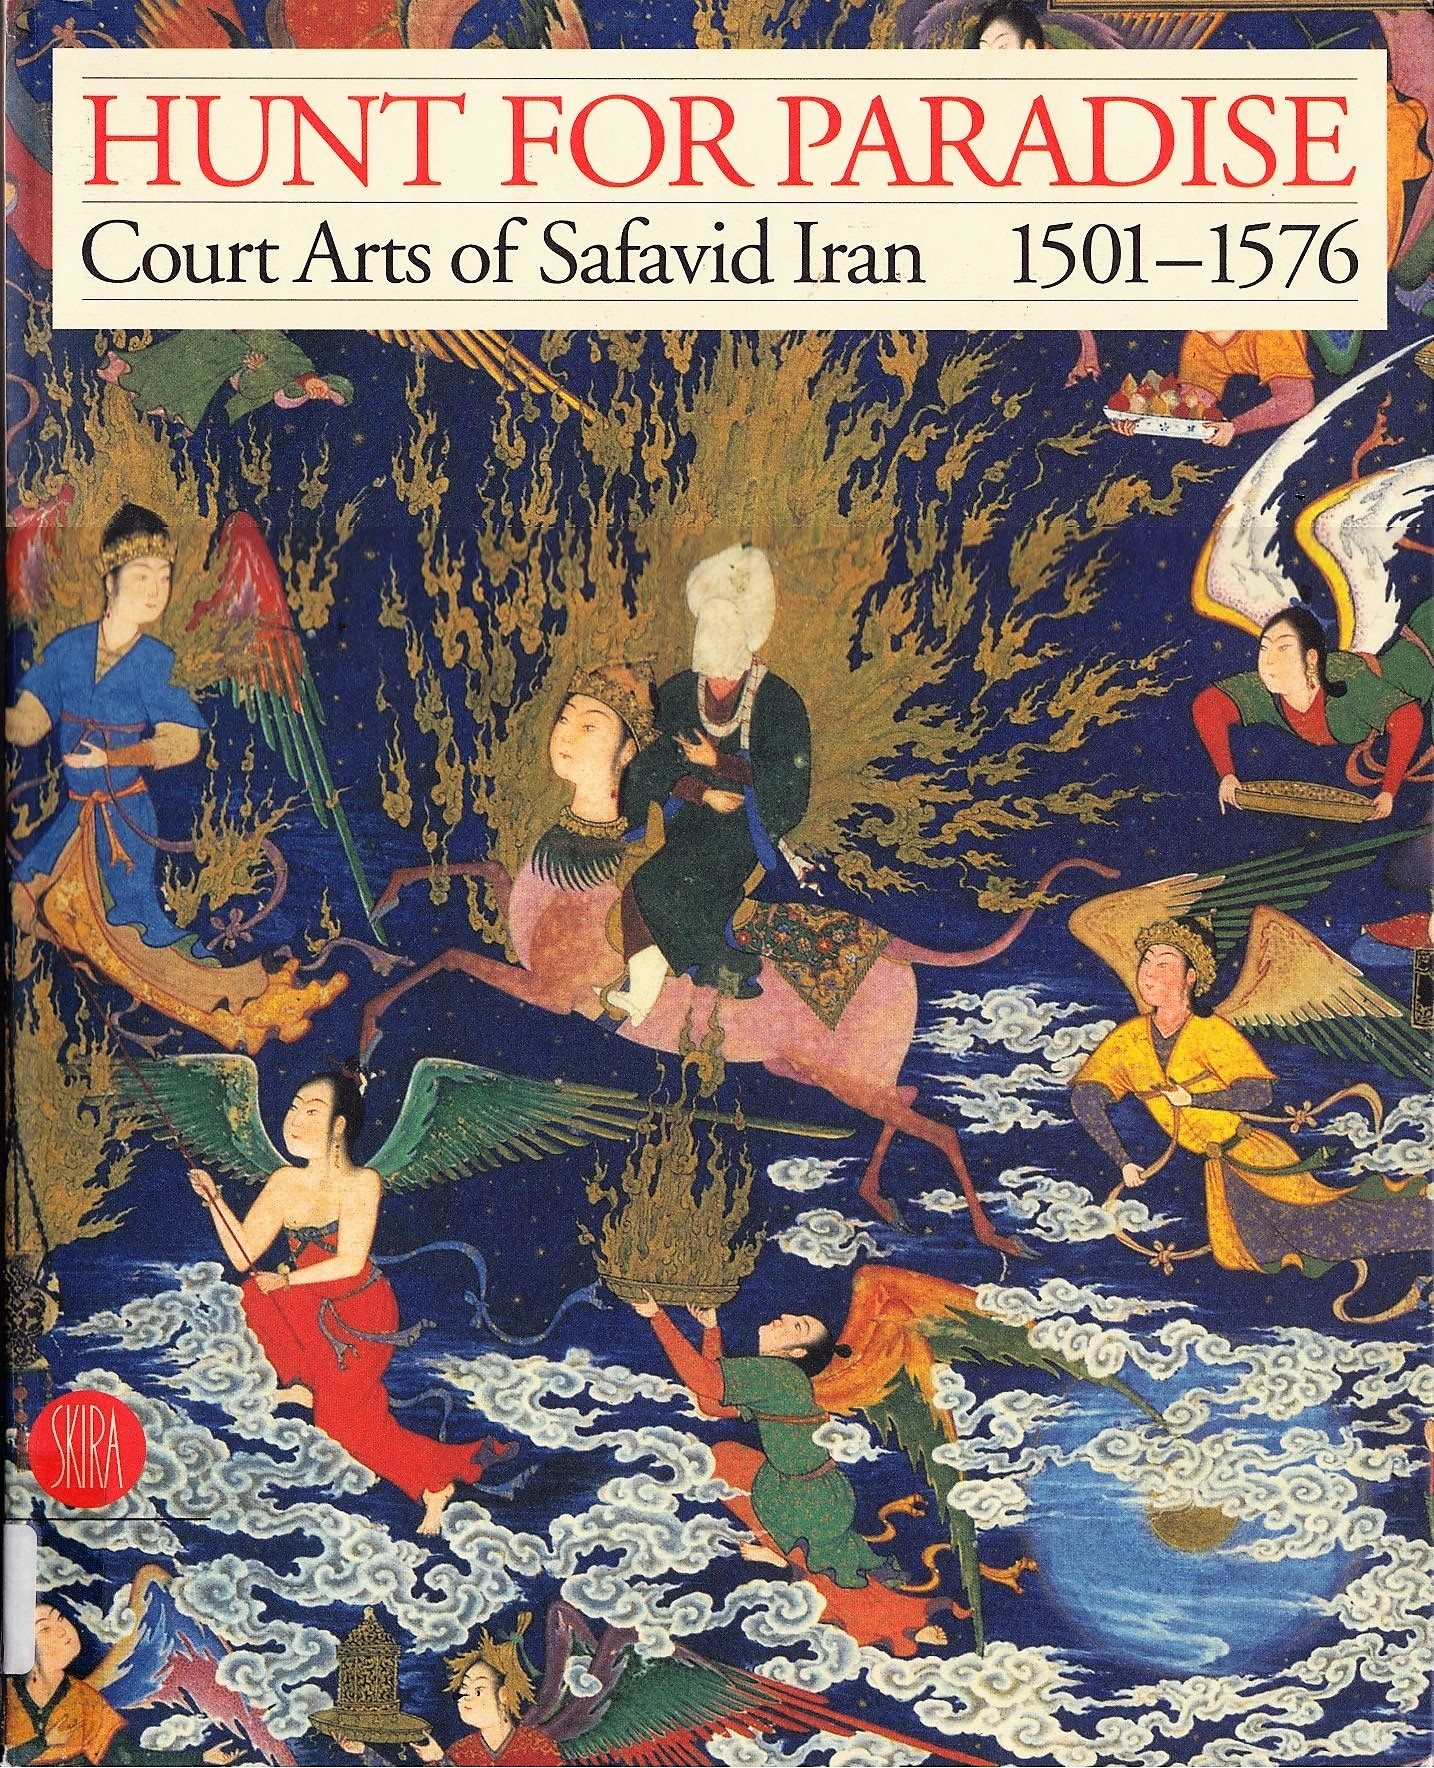 061 Hunt For Paradise. Court Arts of Safavid Iran 1501-1576 (4)